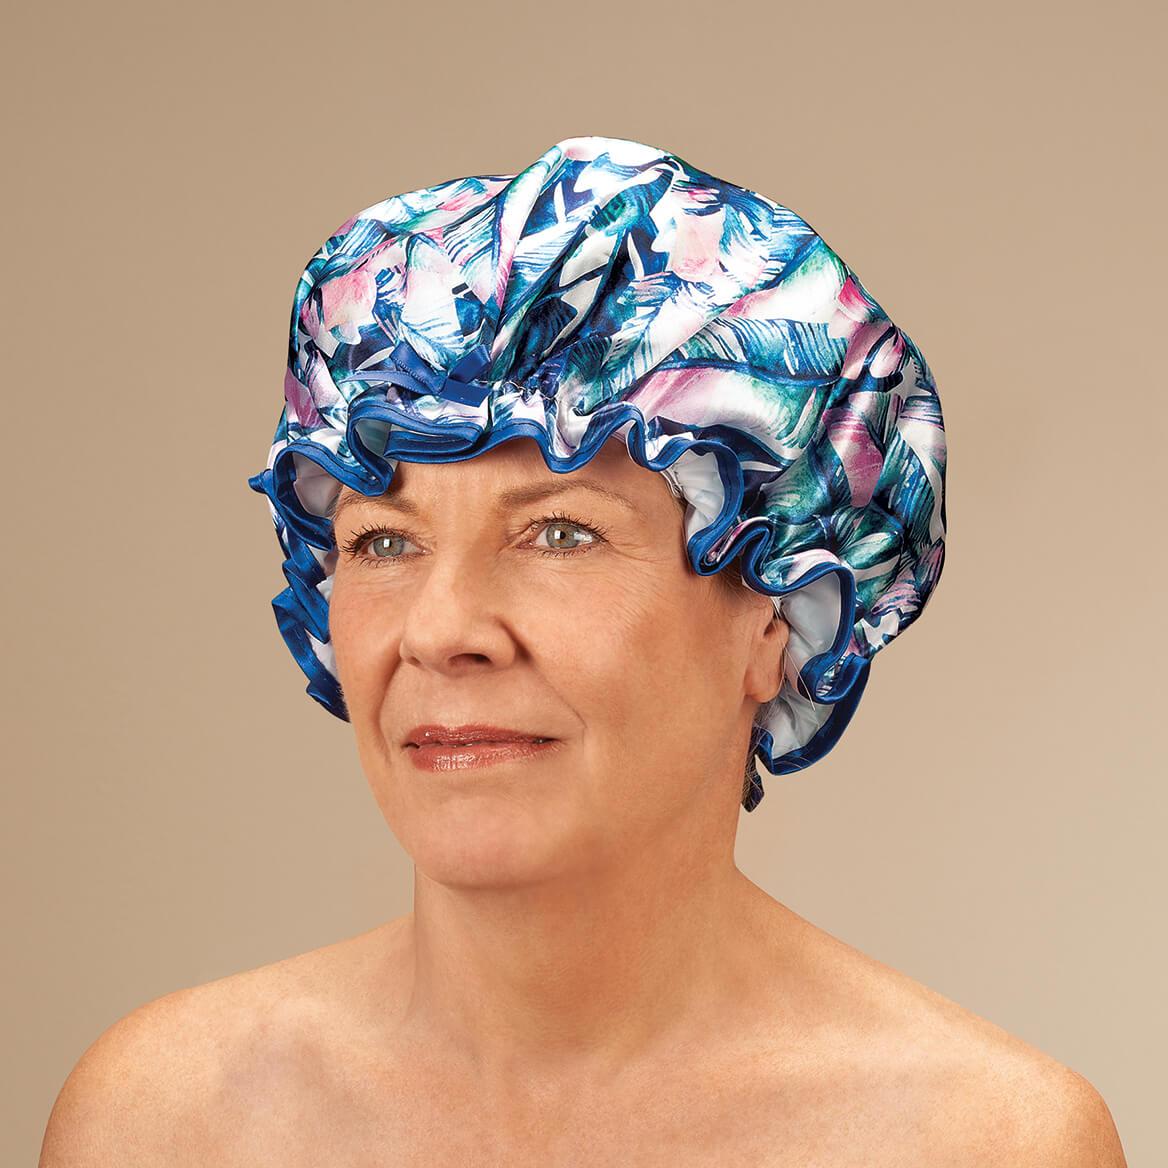 Fashion Shower Cap-346111